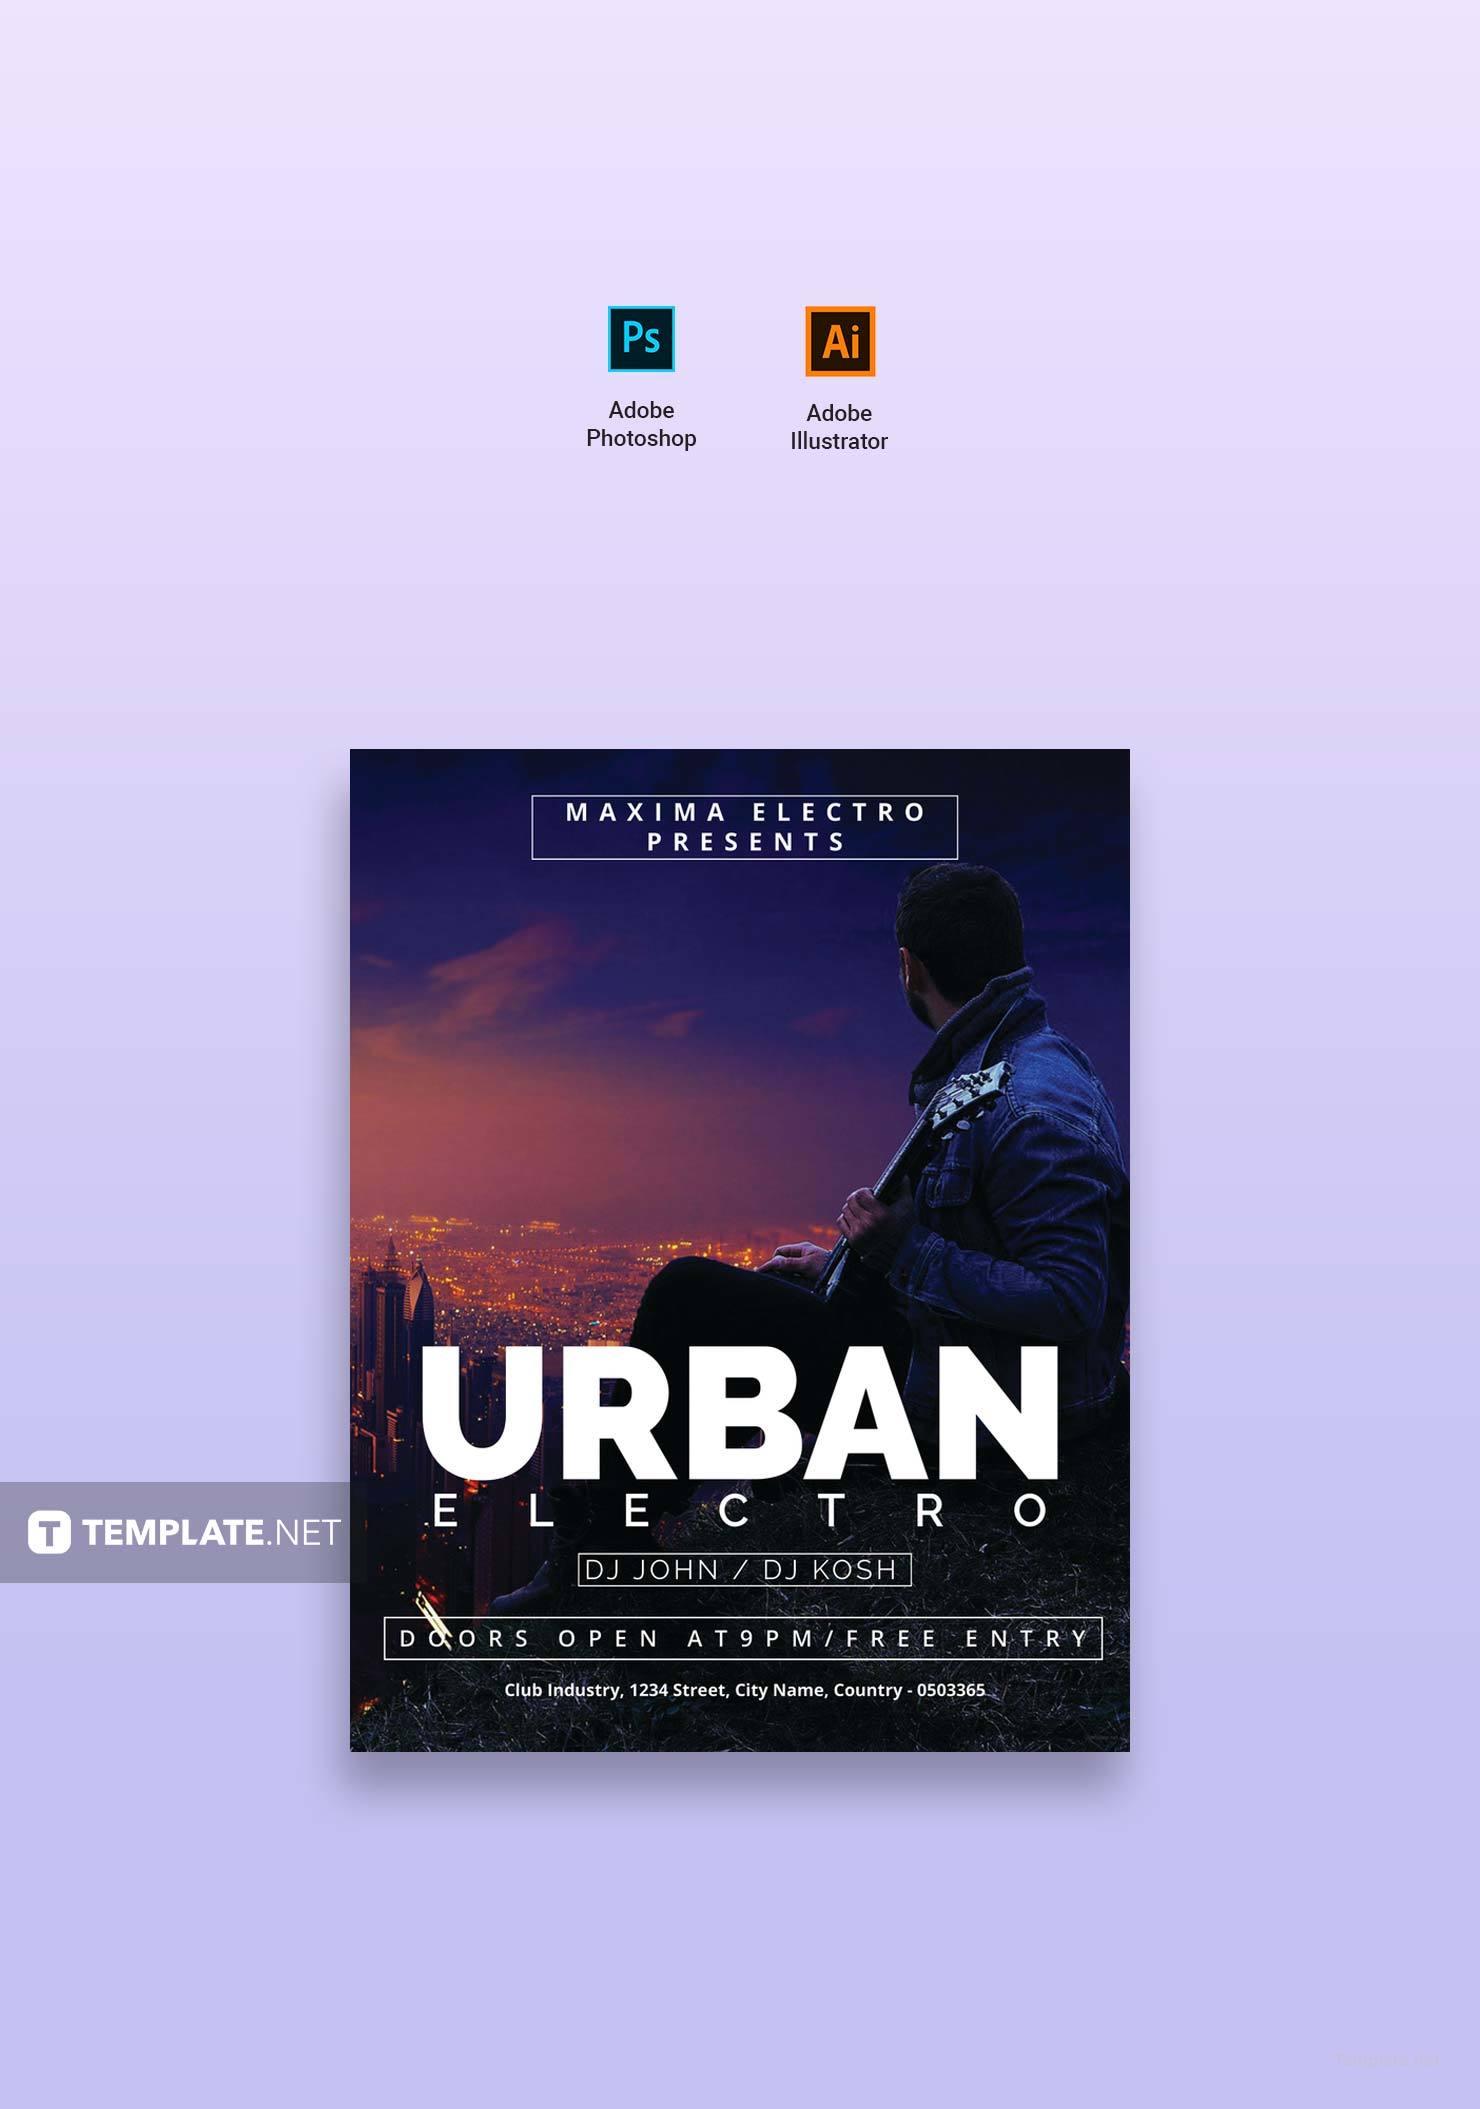 Free Urban Electro DJ Flyer Template Adobe Illustrator Photoshop - Adobe illustrator flyer template